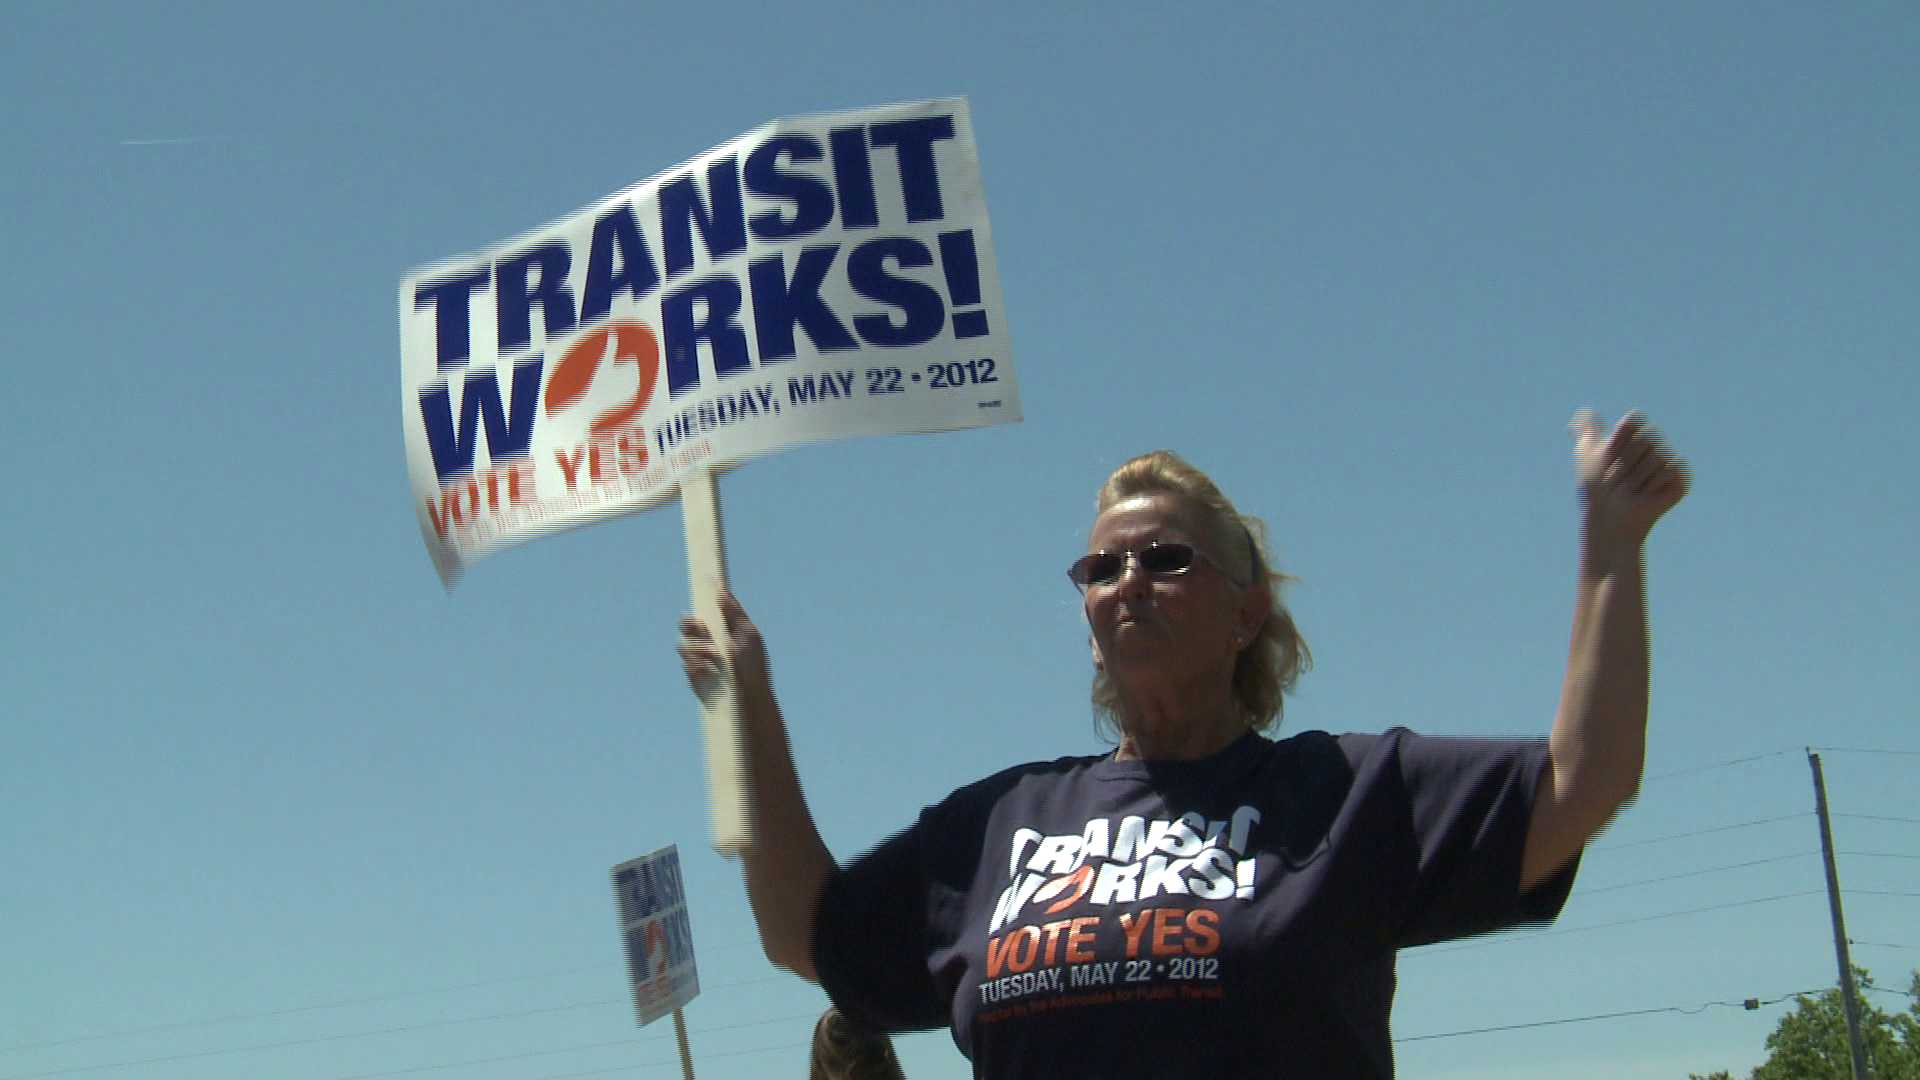 transittaxwoman